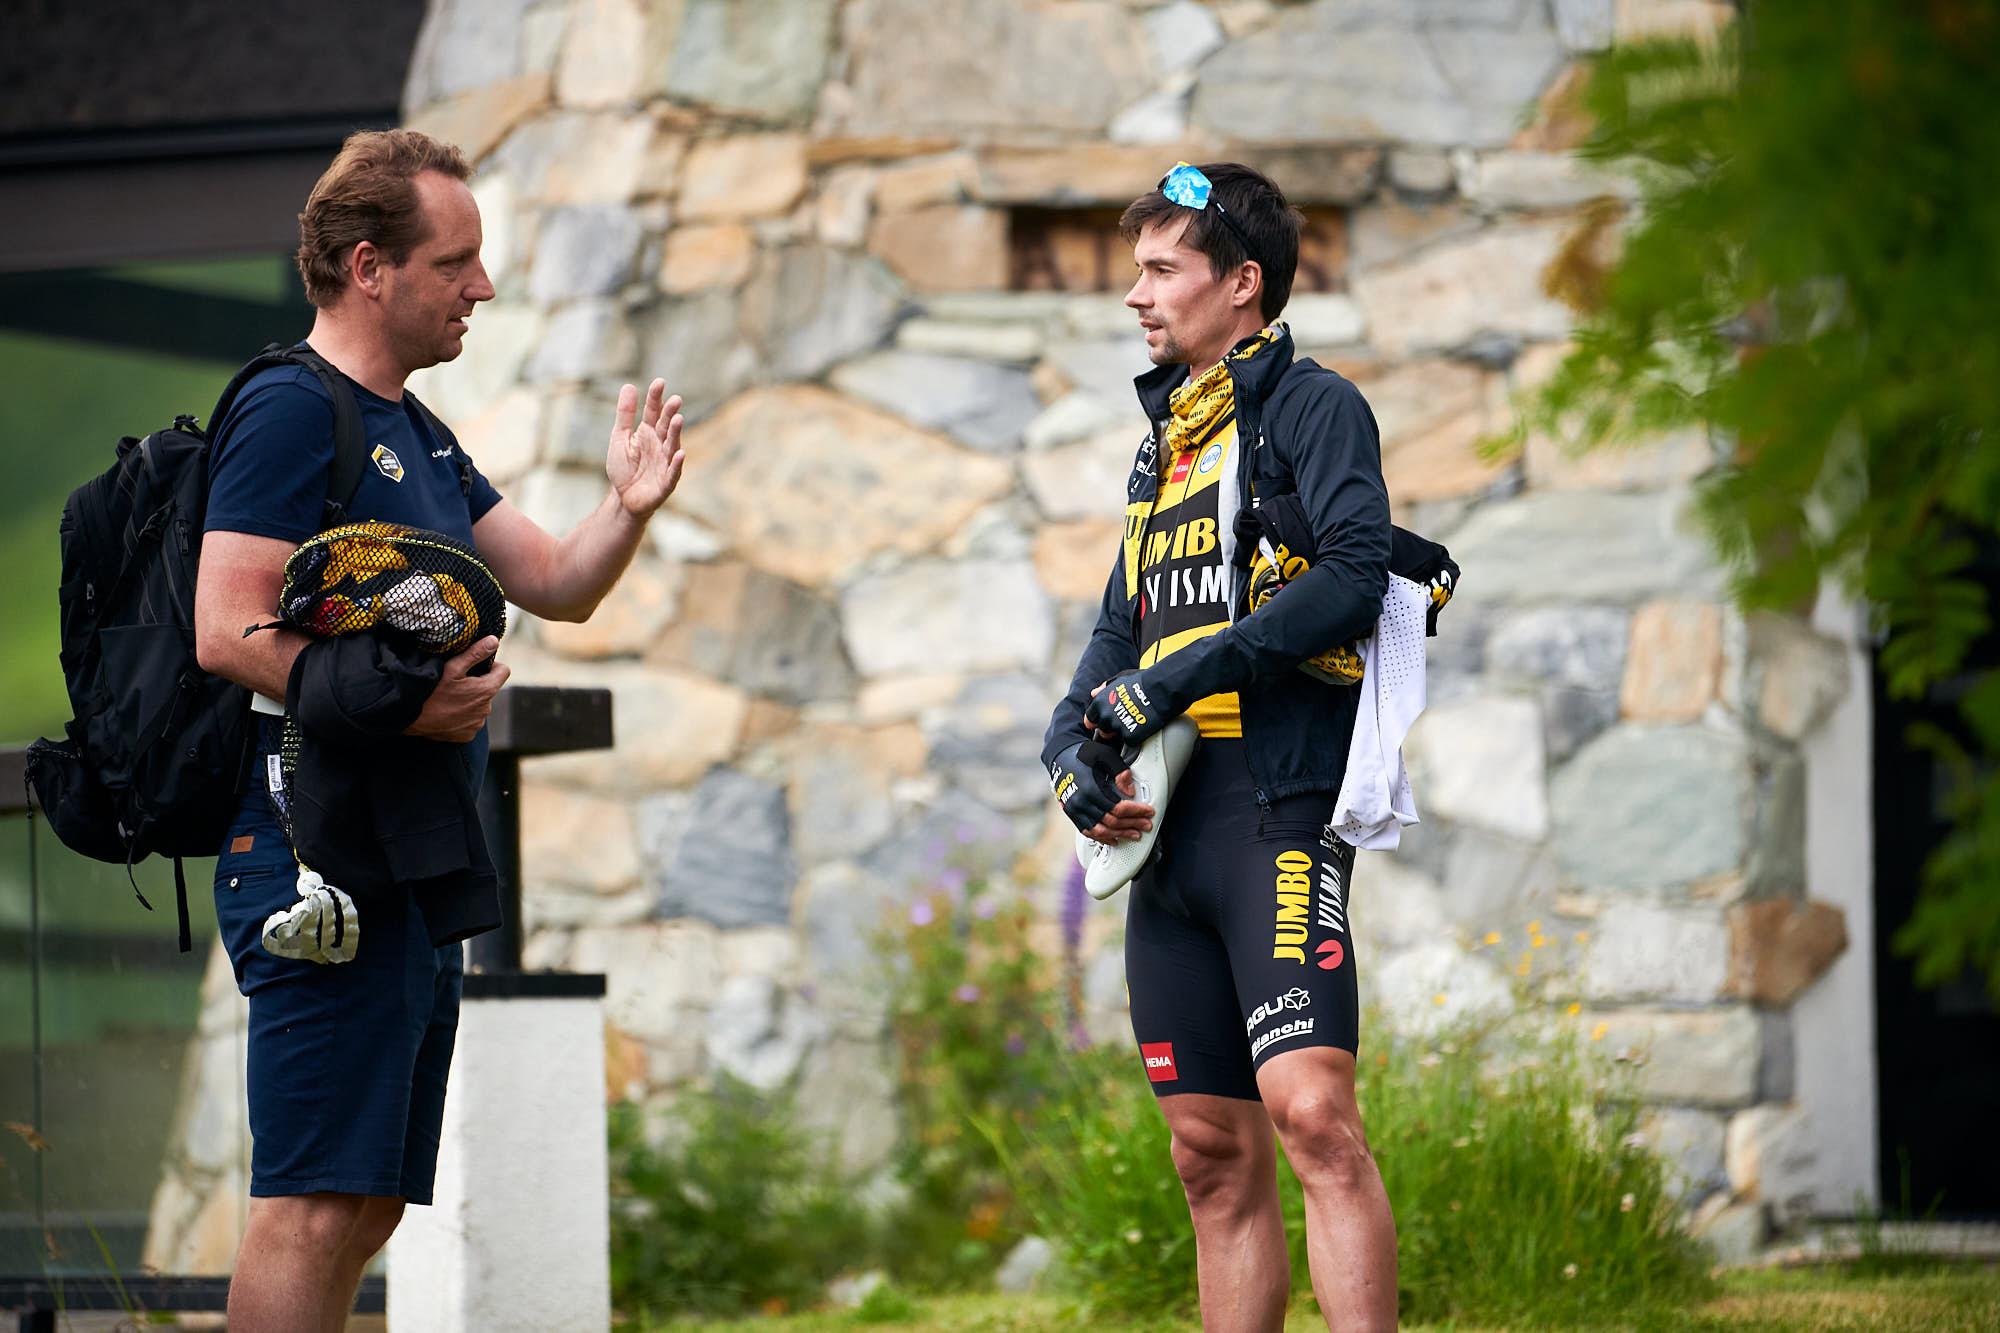 Primoz Roglic and Merijn Zeeman talking before training